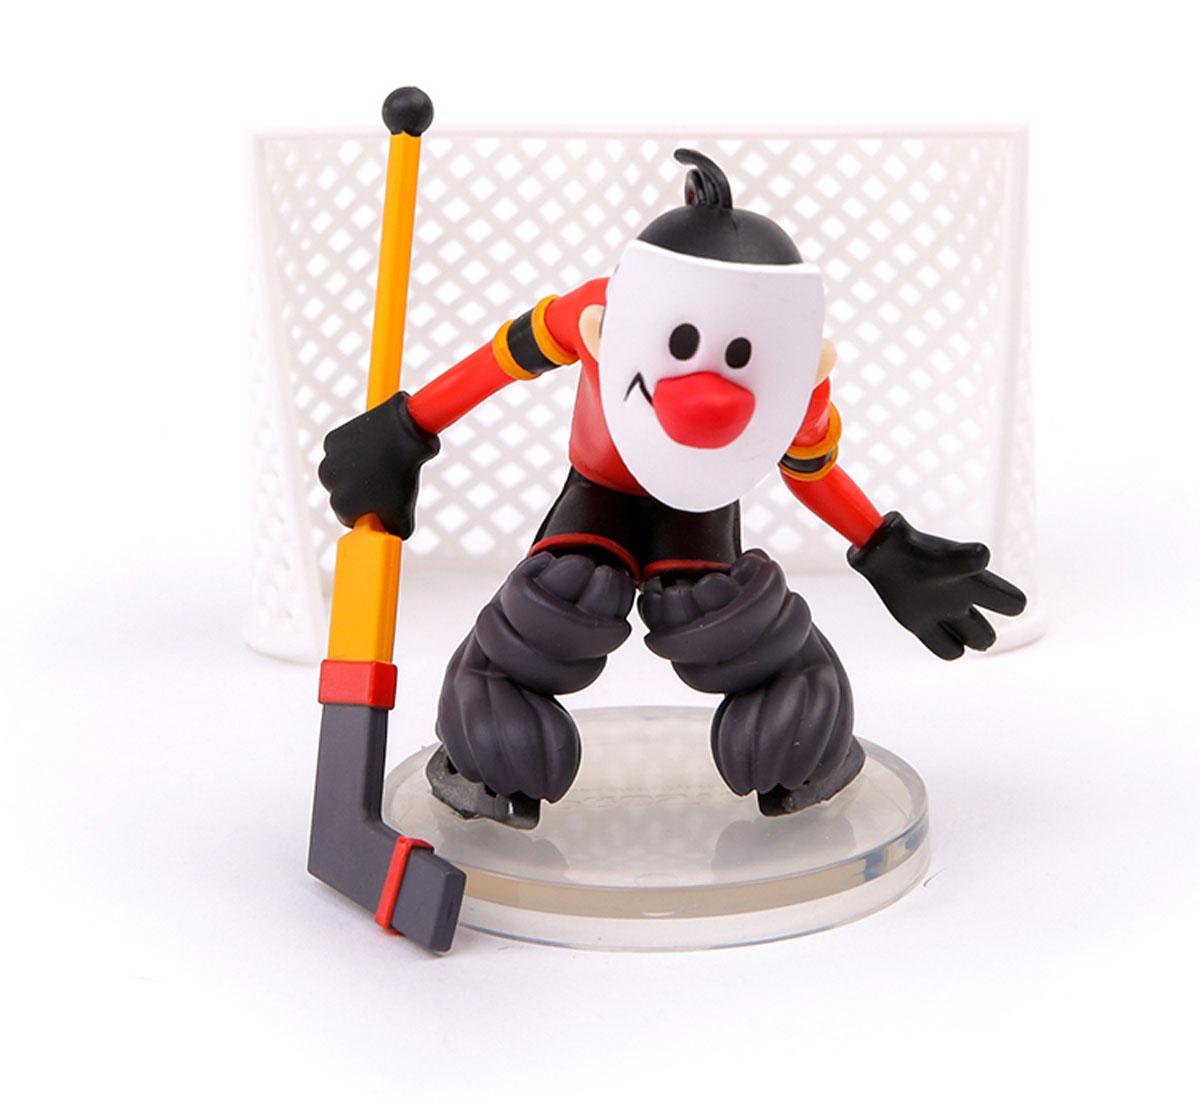 PROSTO toys Фигурка Вратарь Метеор как билет на хоккейный матч салавата юлаева